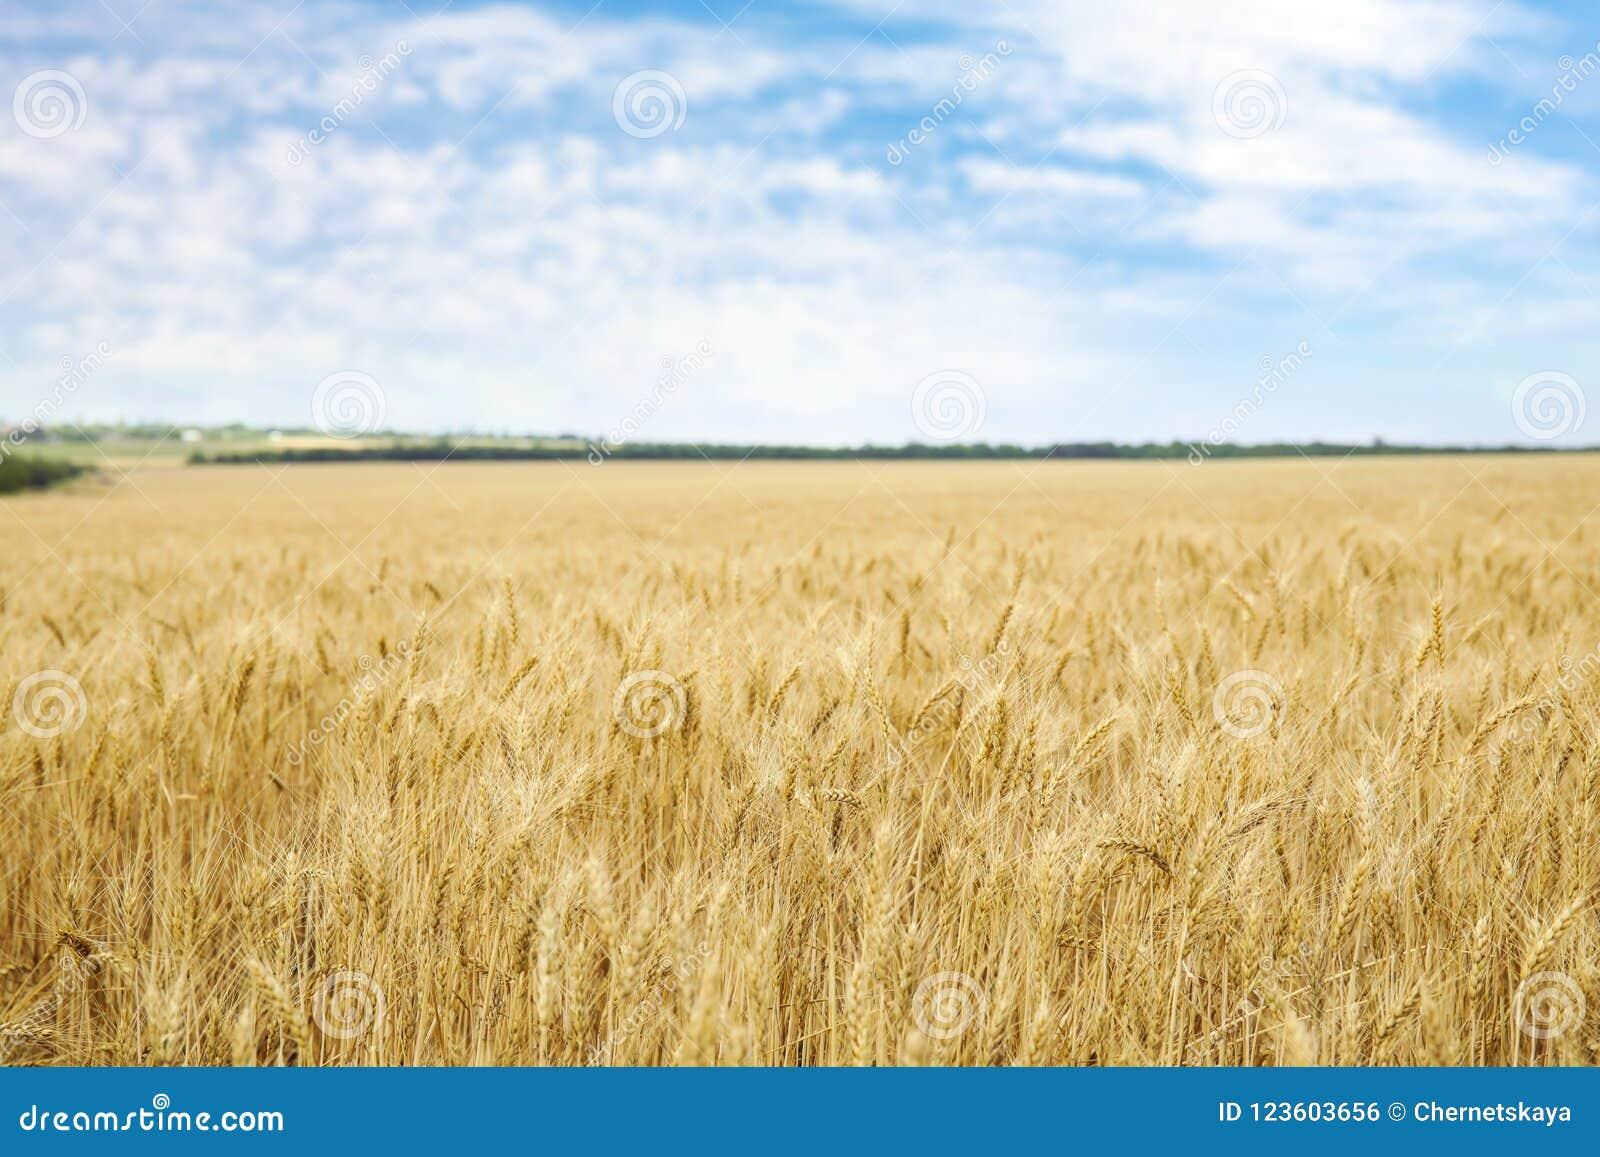 Trigo de oro en campo de grano